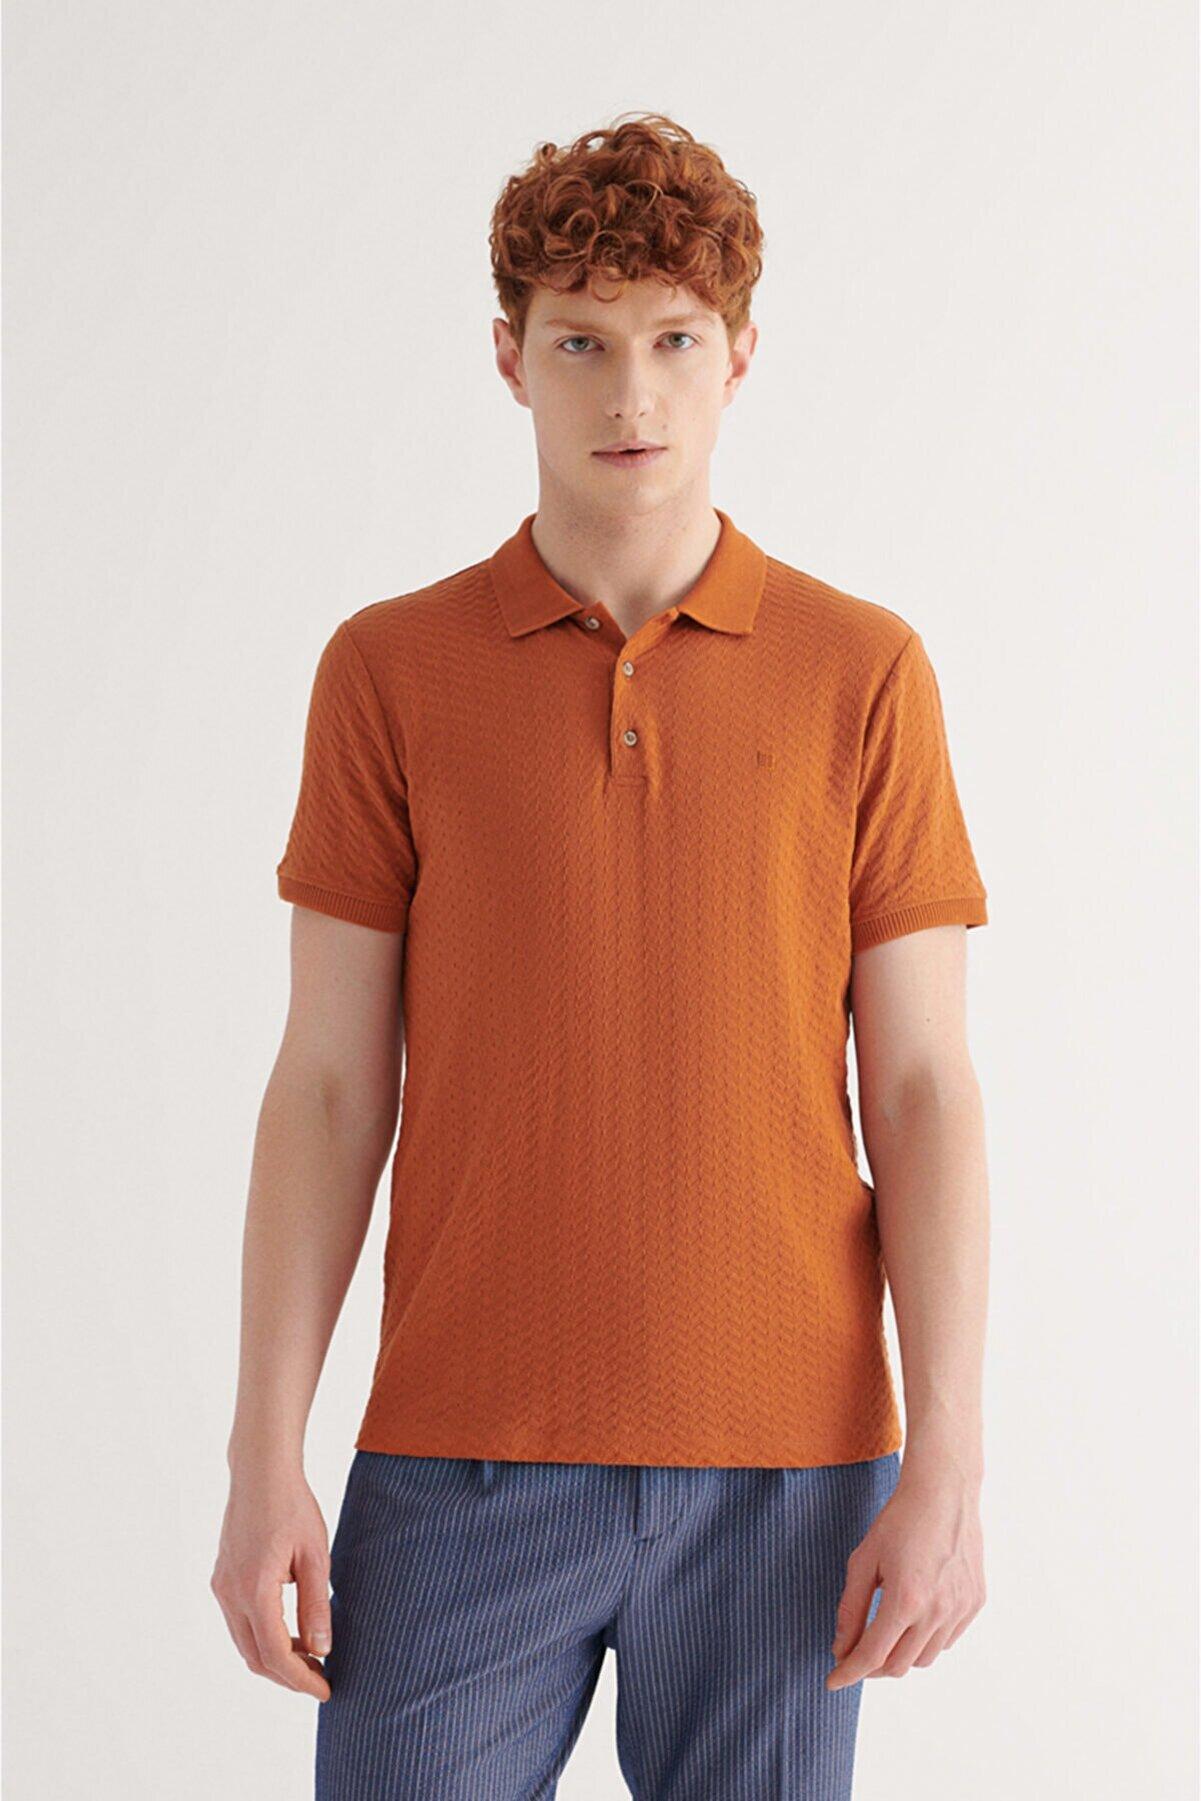 Avva Erkek Kiremit Polo Yaka Jakarlı T-shirt A11y1101